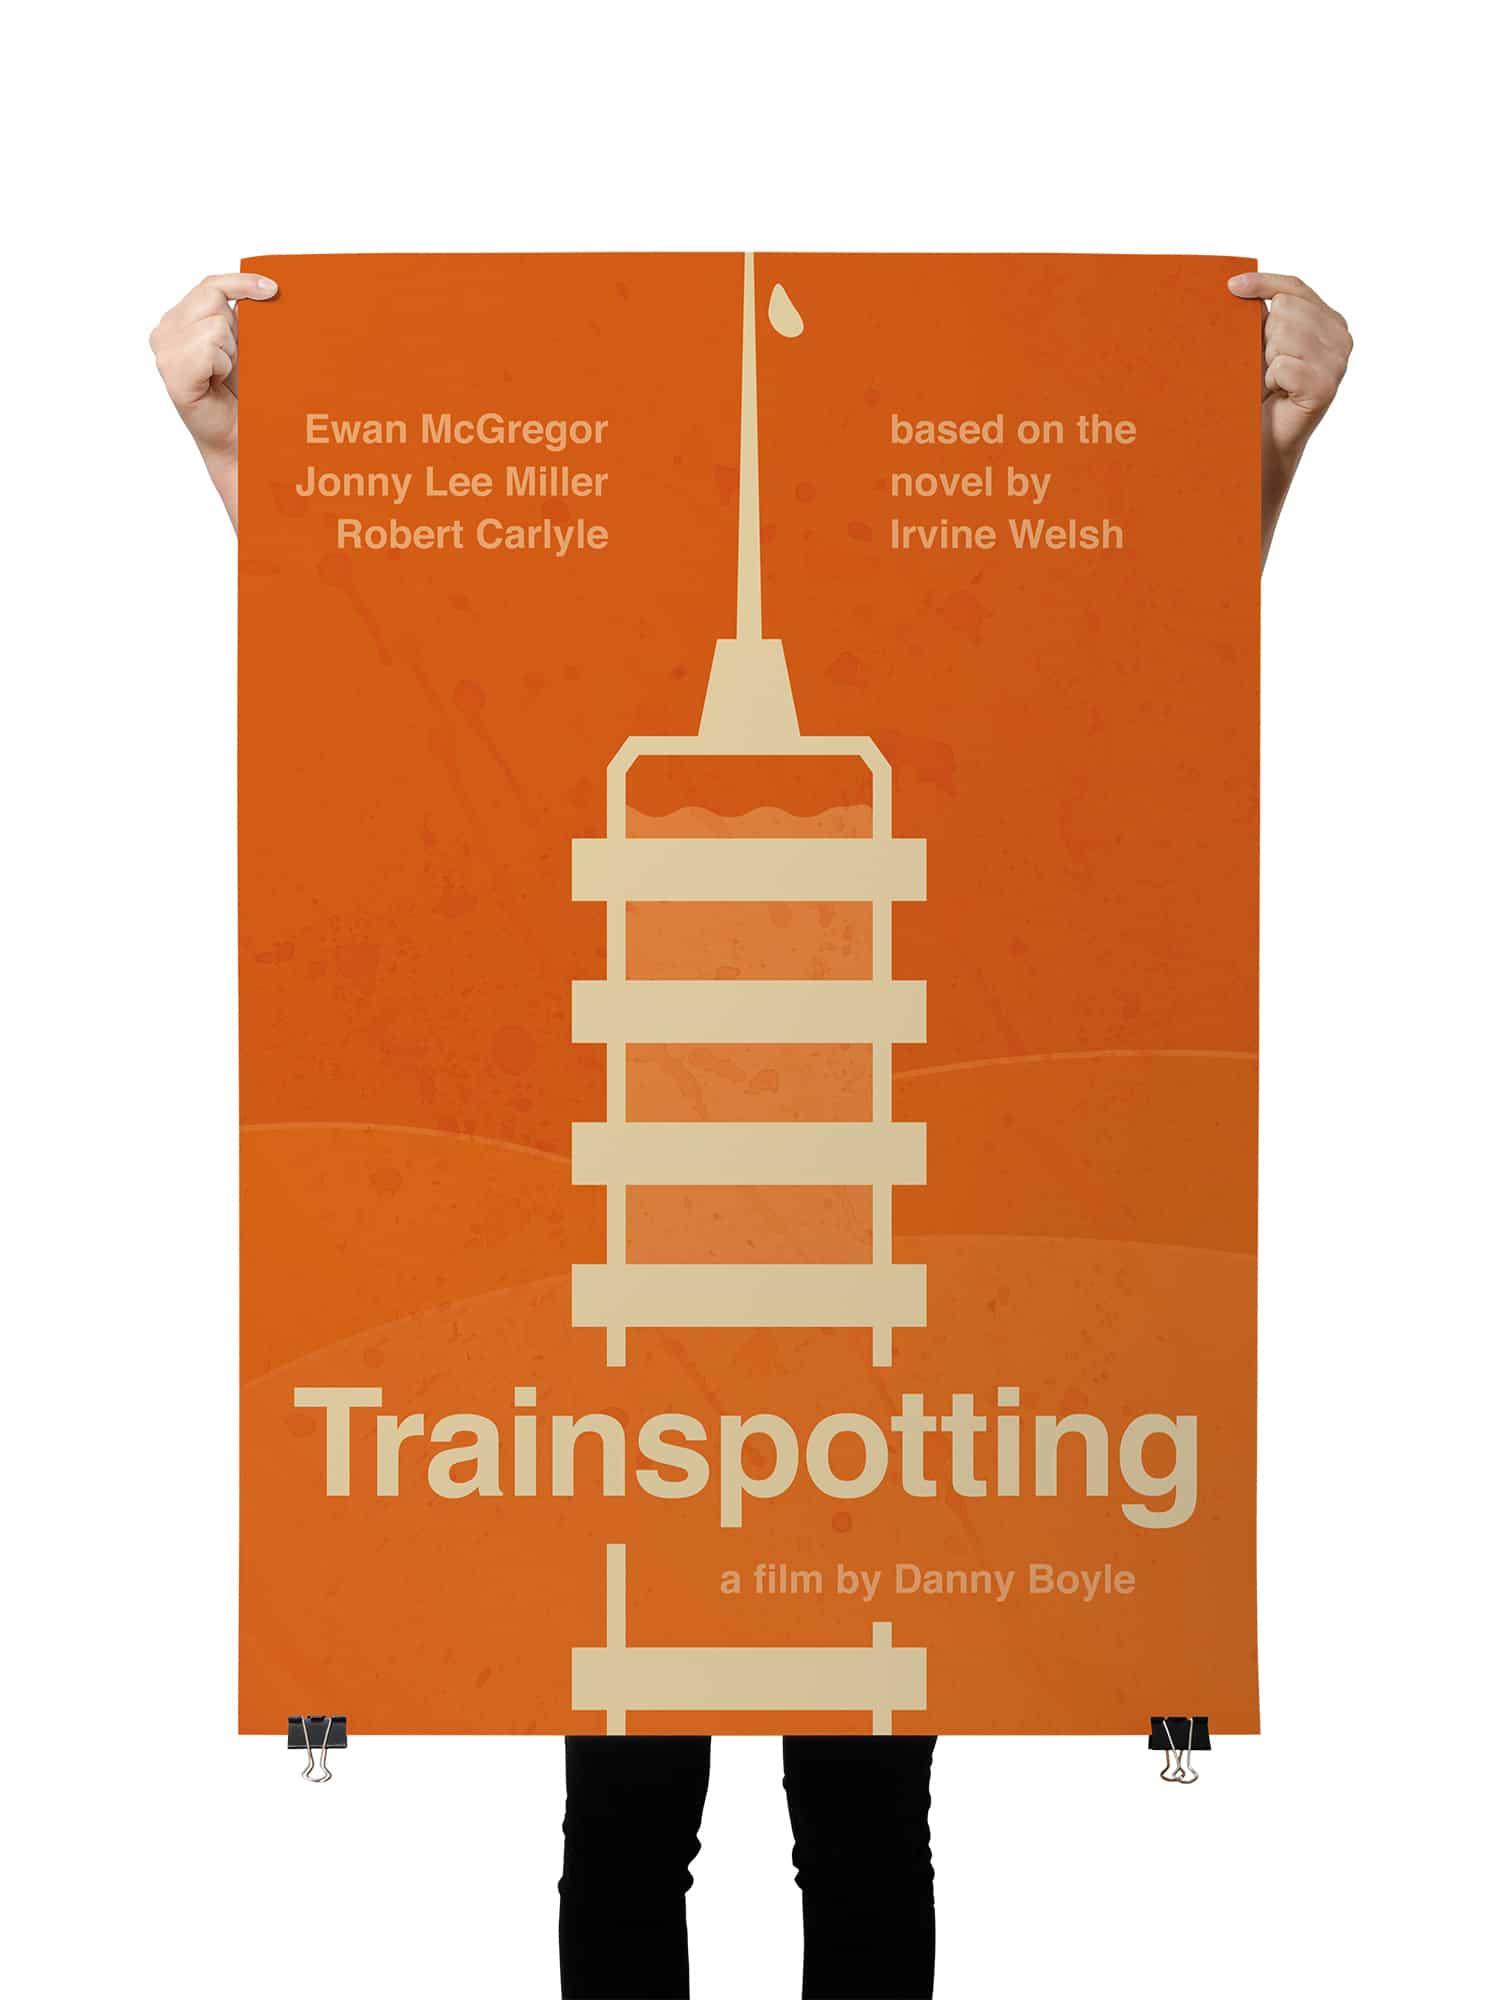 mLehner_Trainspotting_ohneTransparenz_RGB.jpg